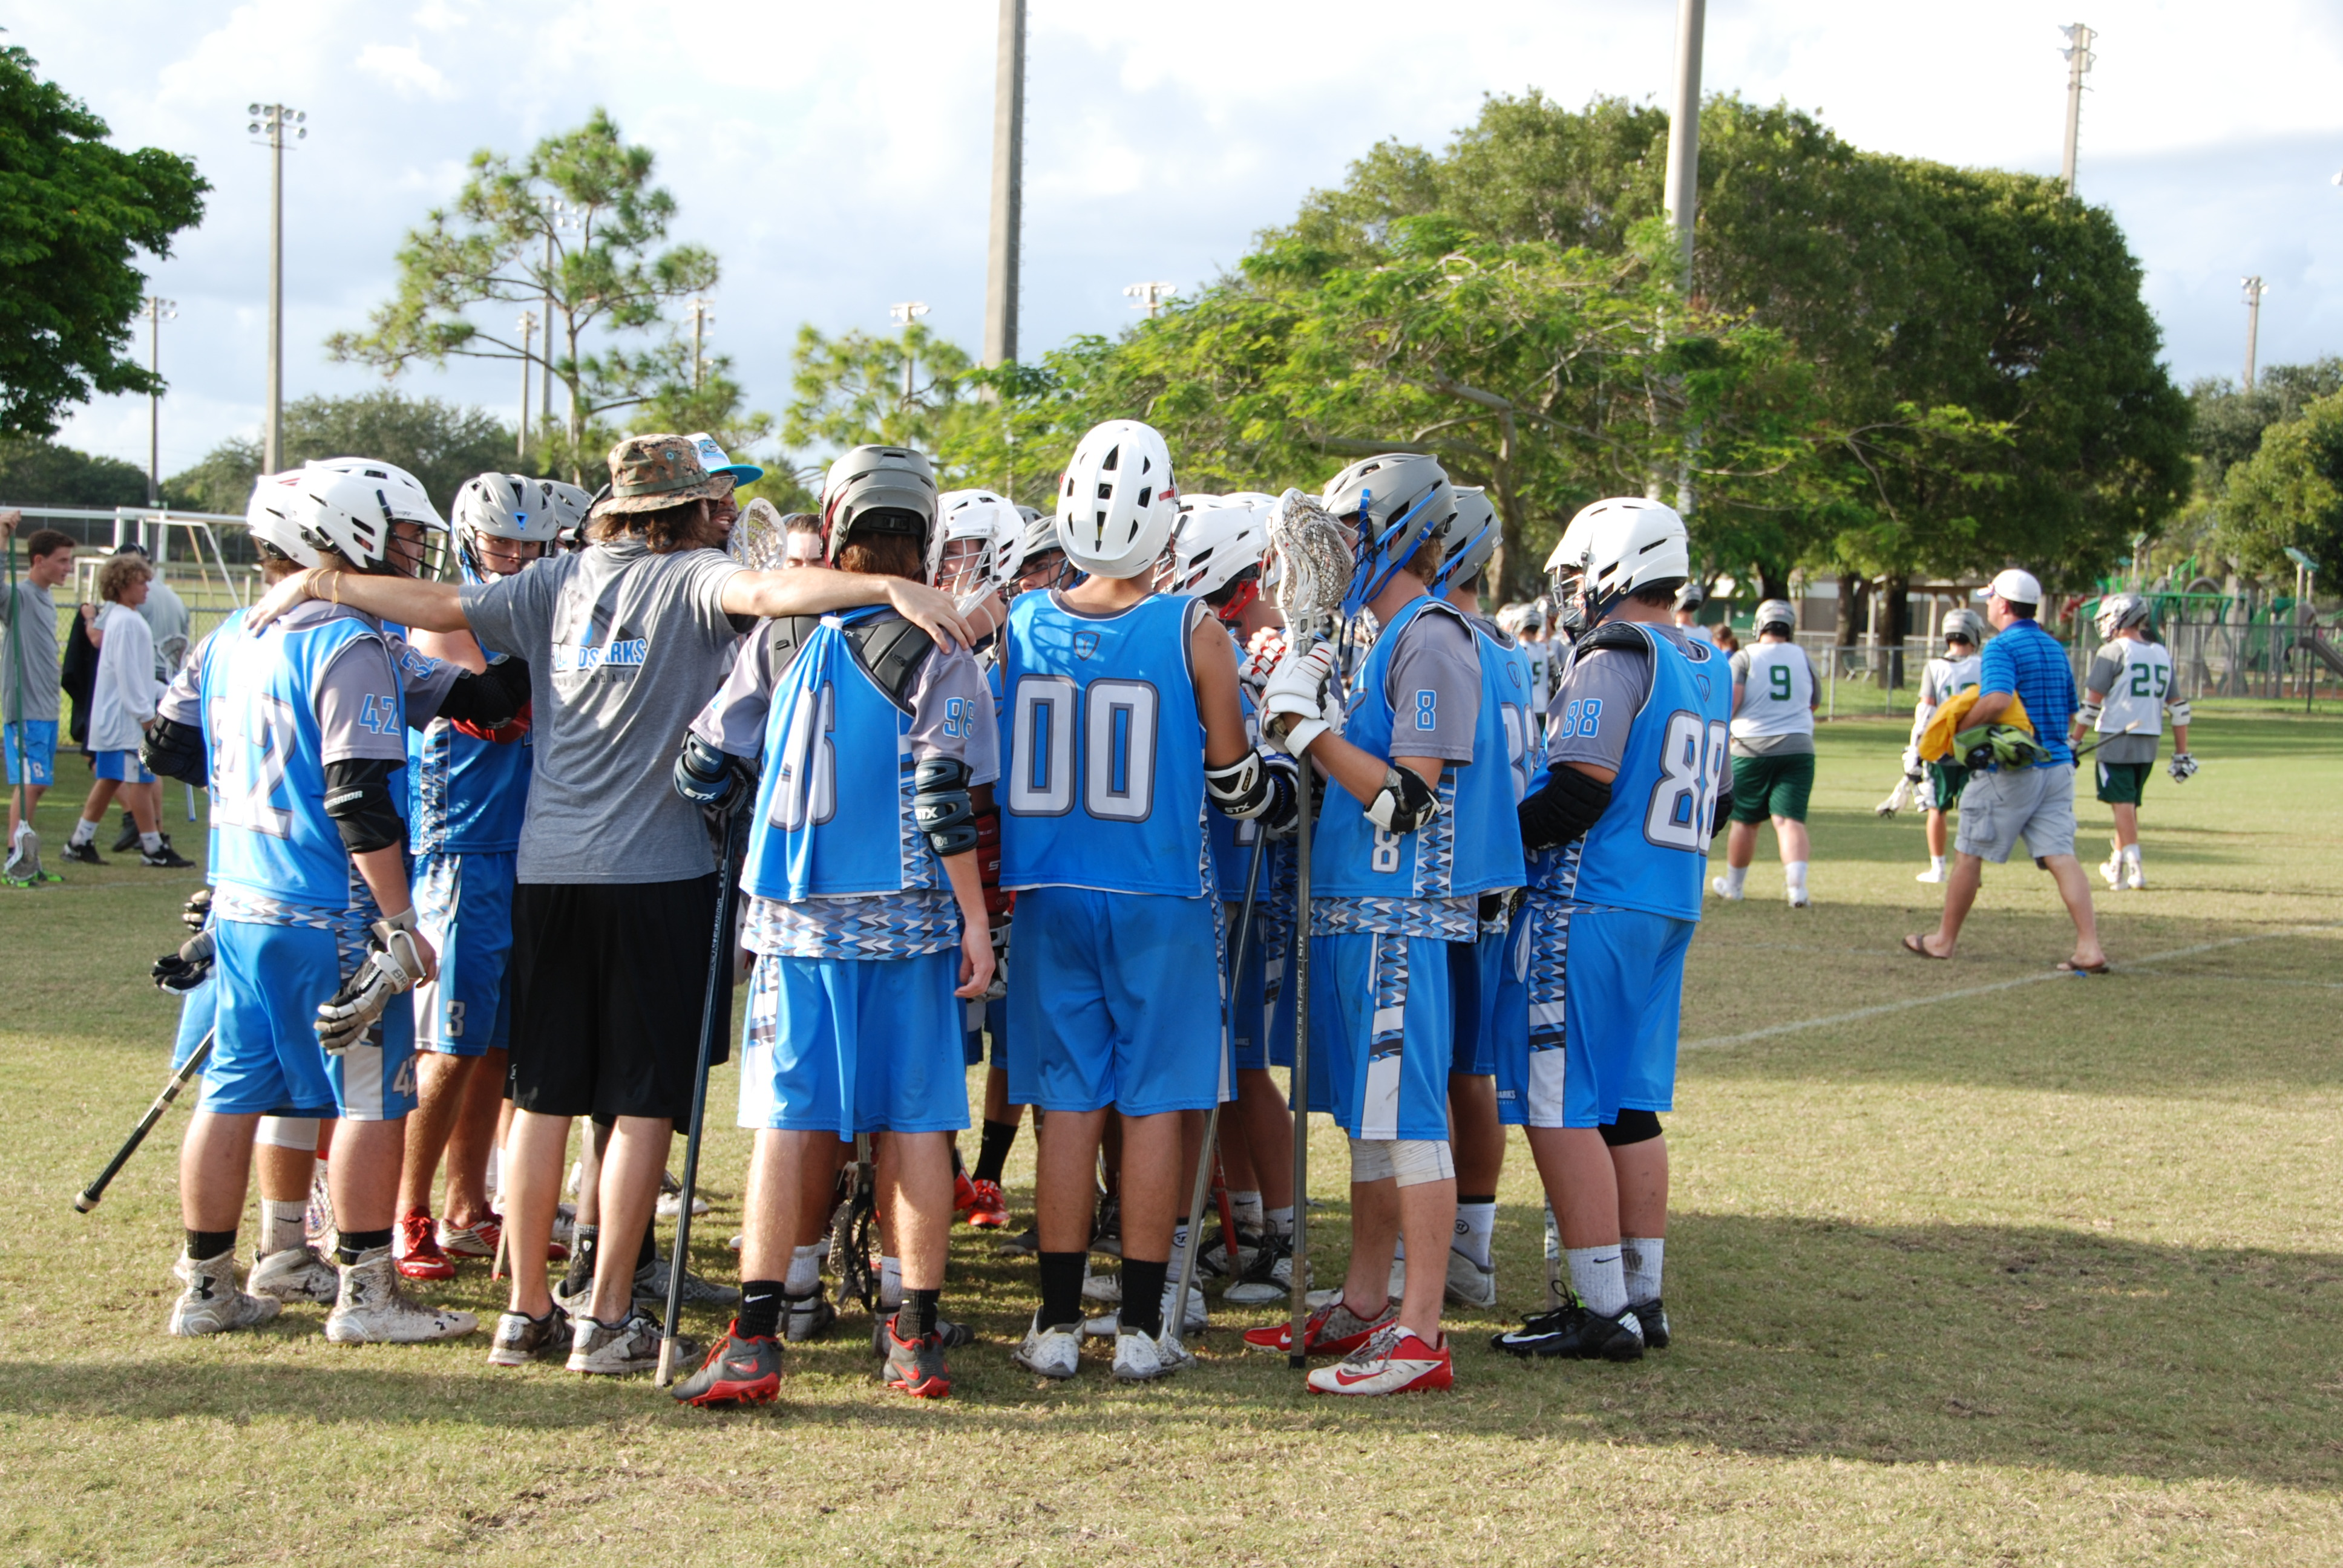 lauderdale-lacrosse-landsharks (17)